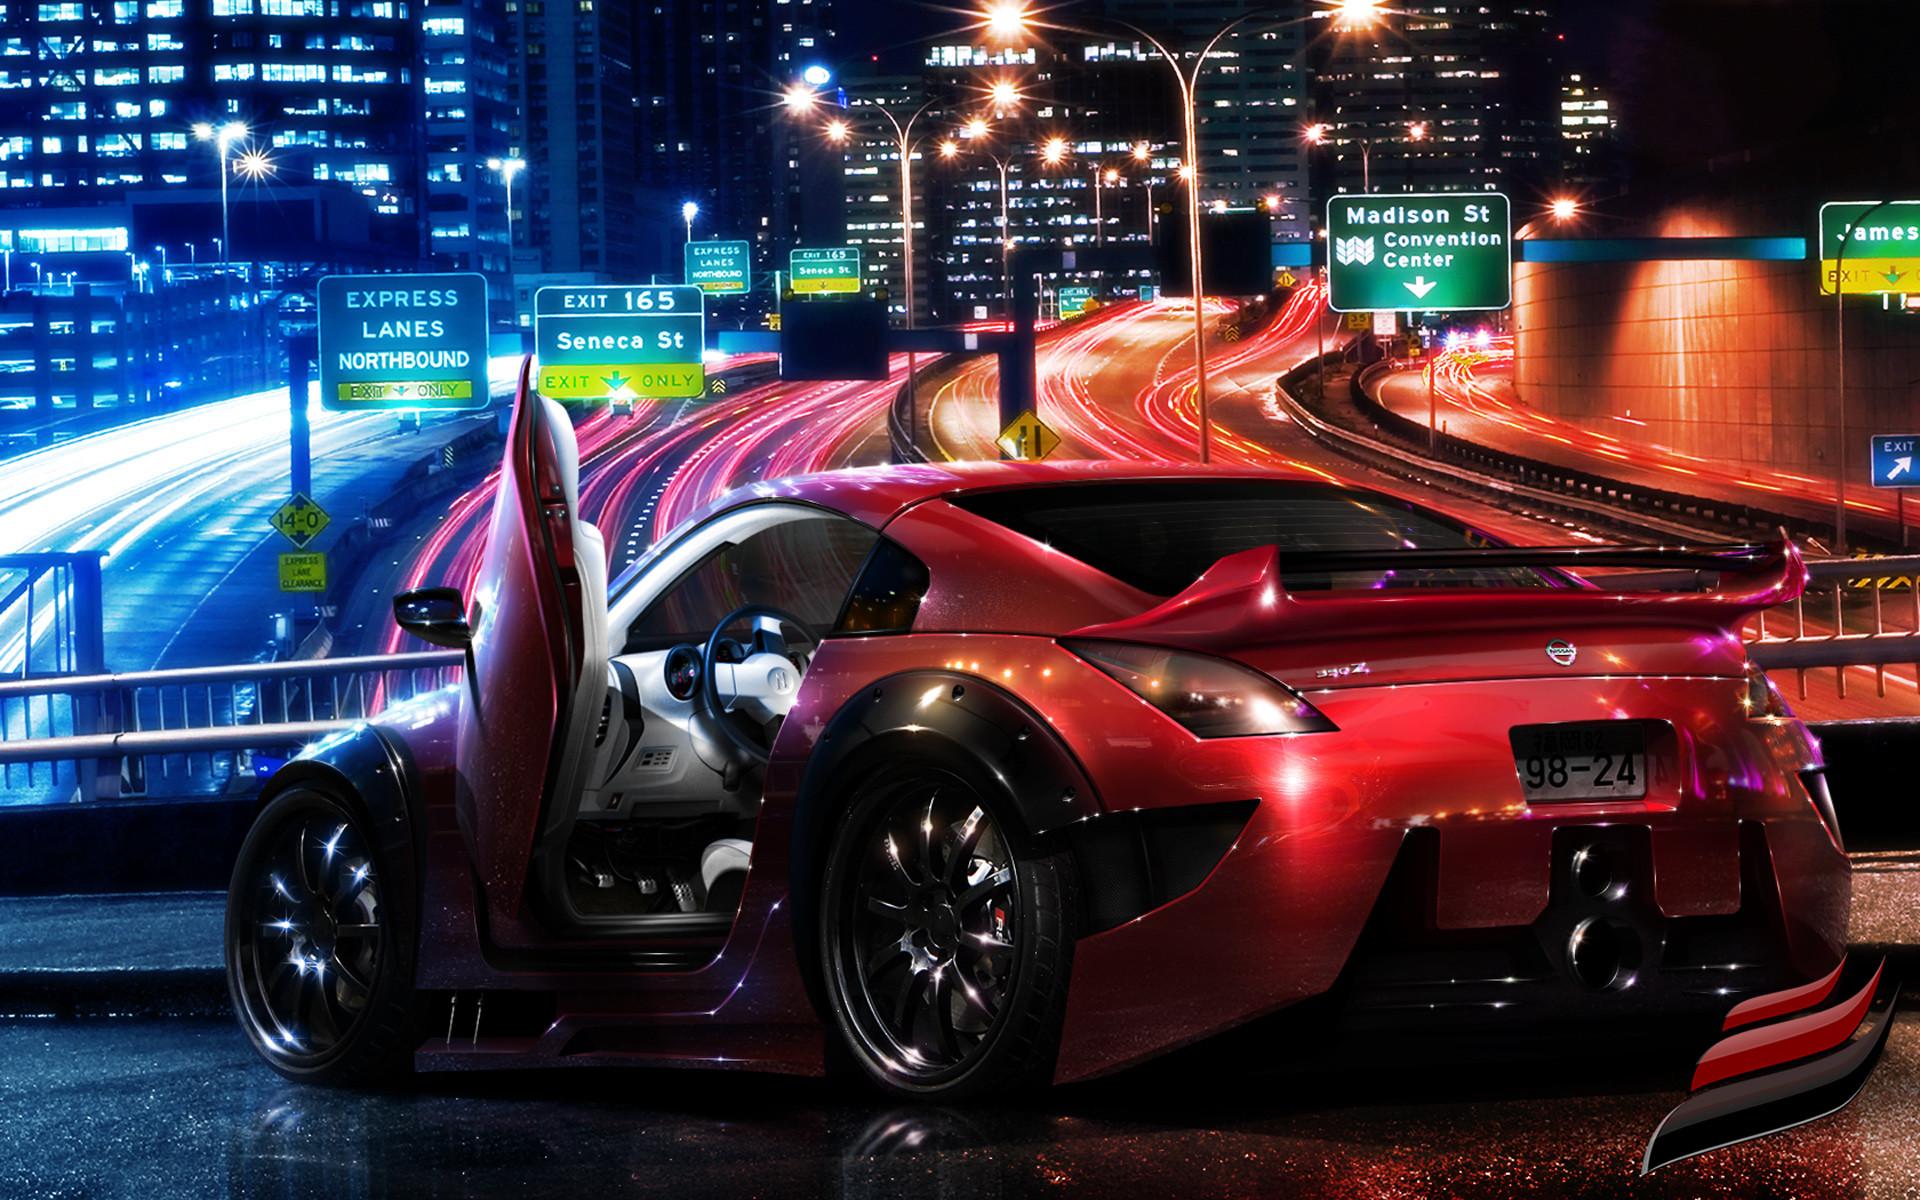 Cars HD Wallpapers – https://whatstrendingonline.com/cars-hd-